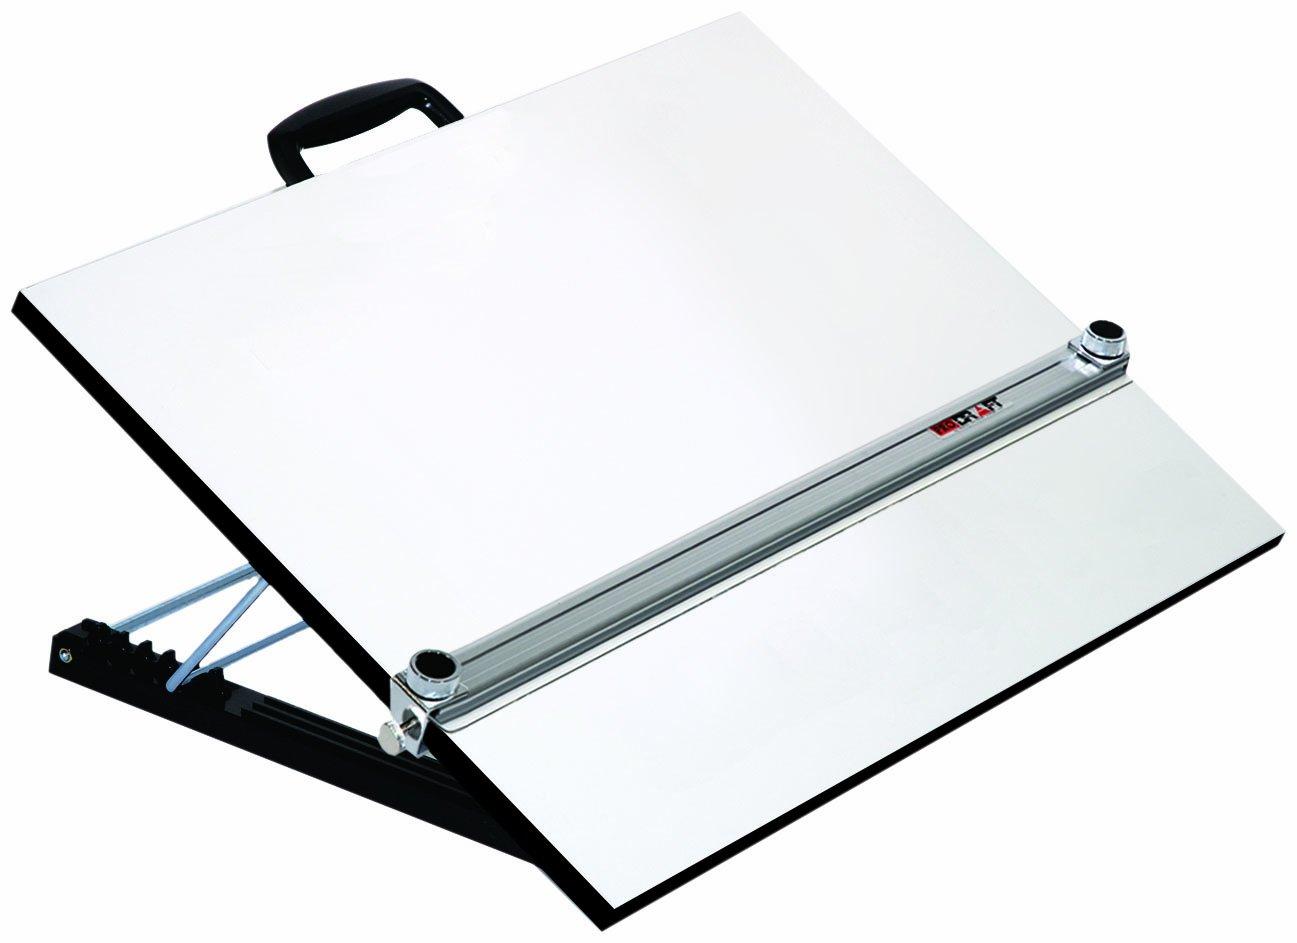 Martin Universal Design U-PEB1824K Adjustable Angle Parallel Drawing Board, Medium, Silver by Martin Universal Design